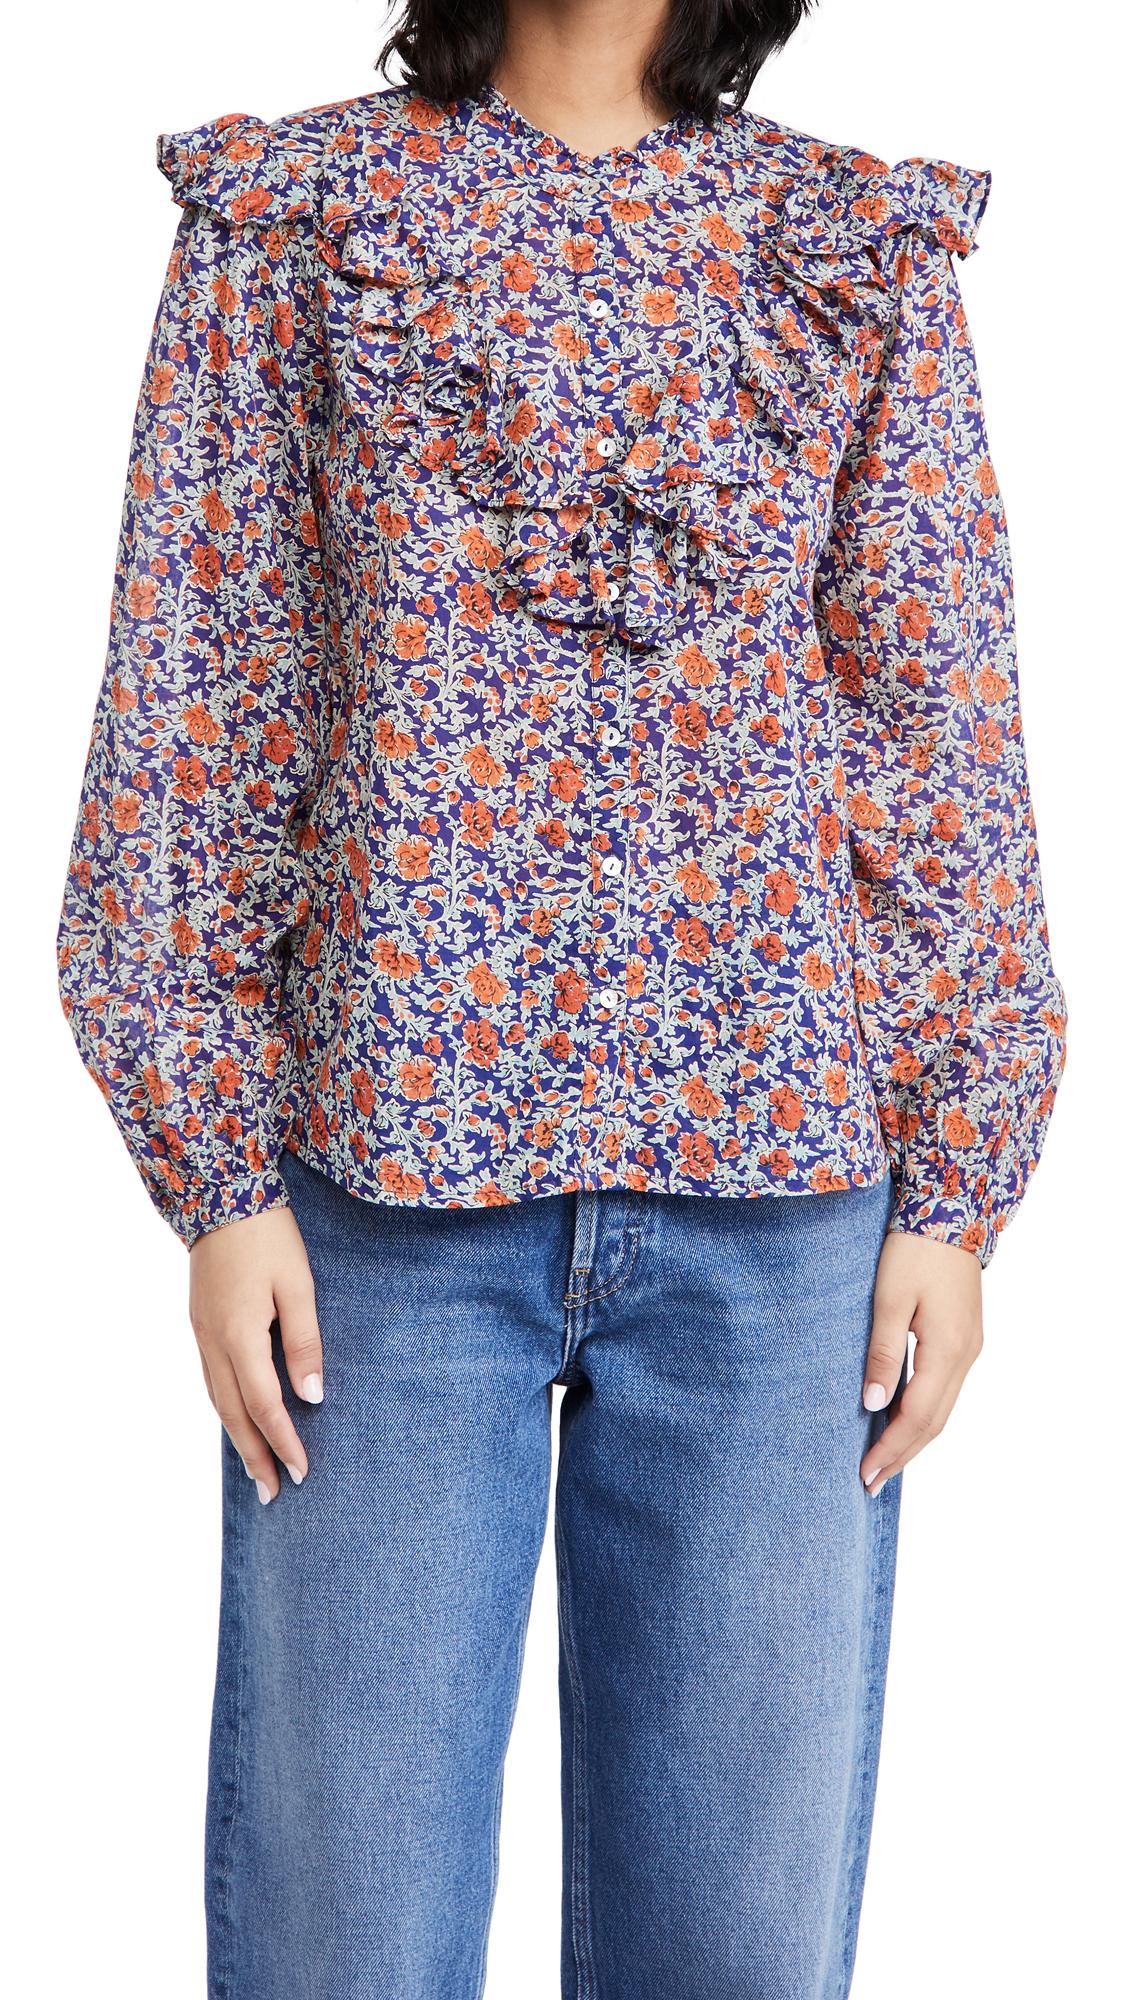 Banjanan Nina Shirt